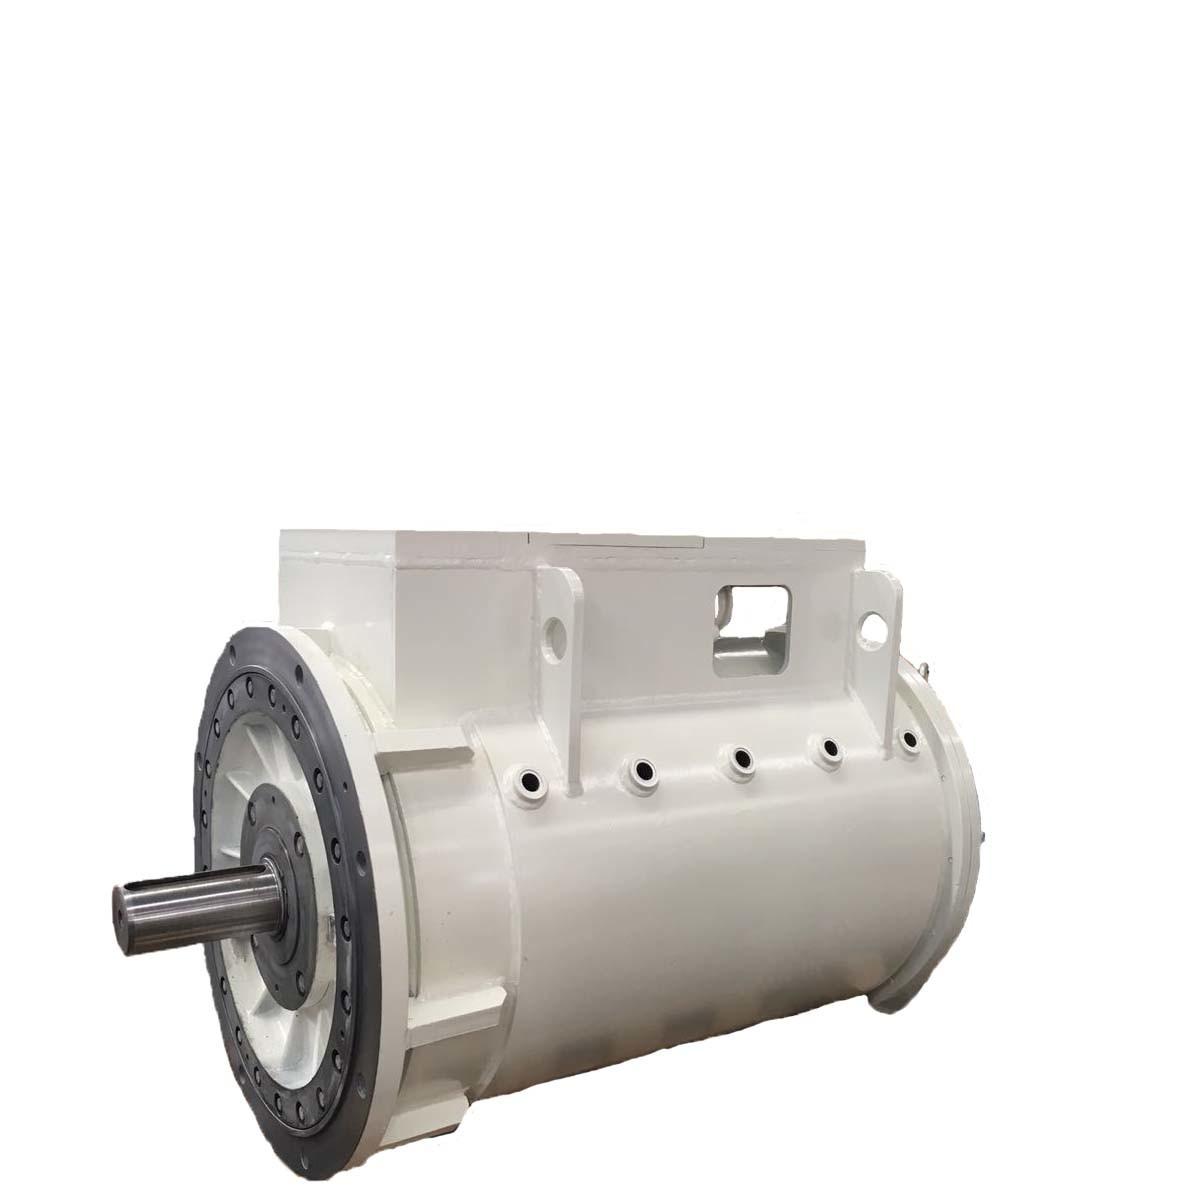 AC Motor/Yali Motor /Explosion-Proof Motor/Water Cooling Motor/Steel Shell Motor